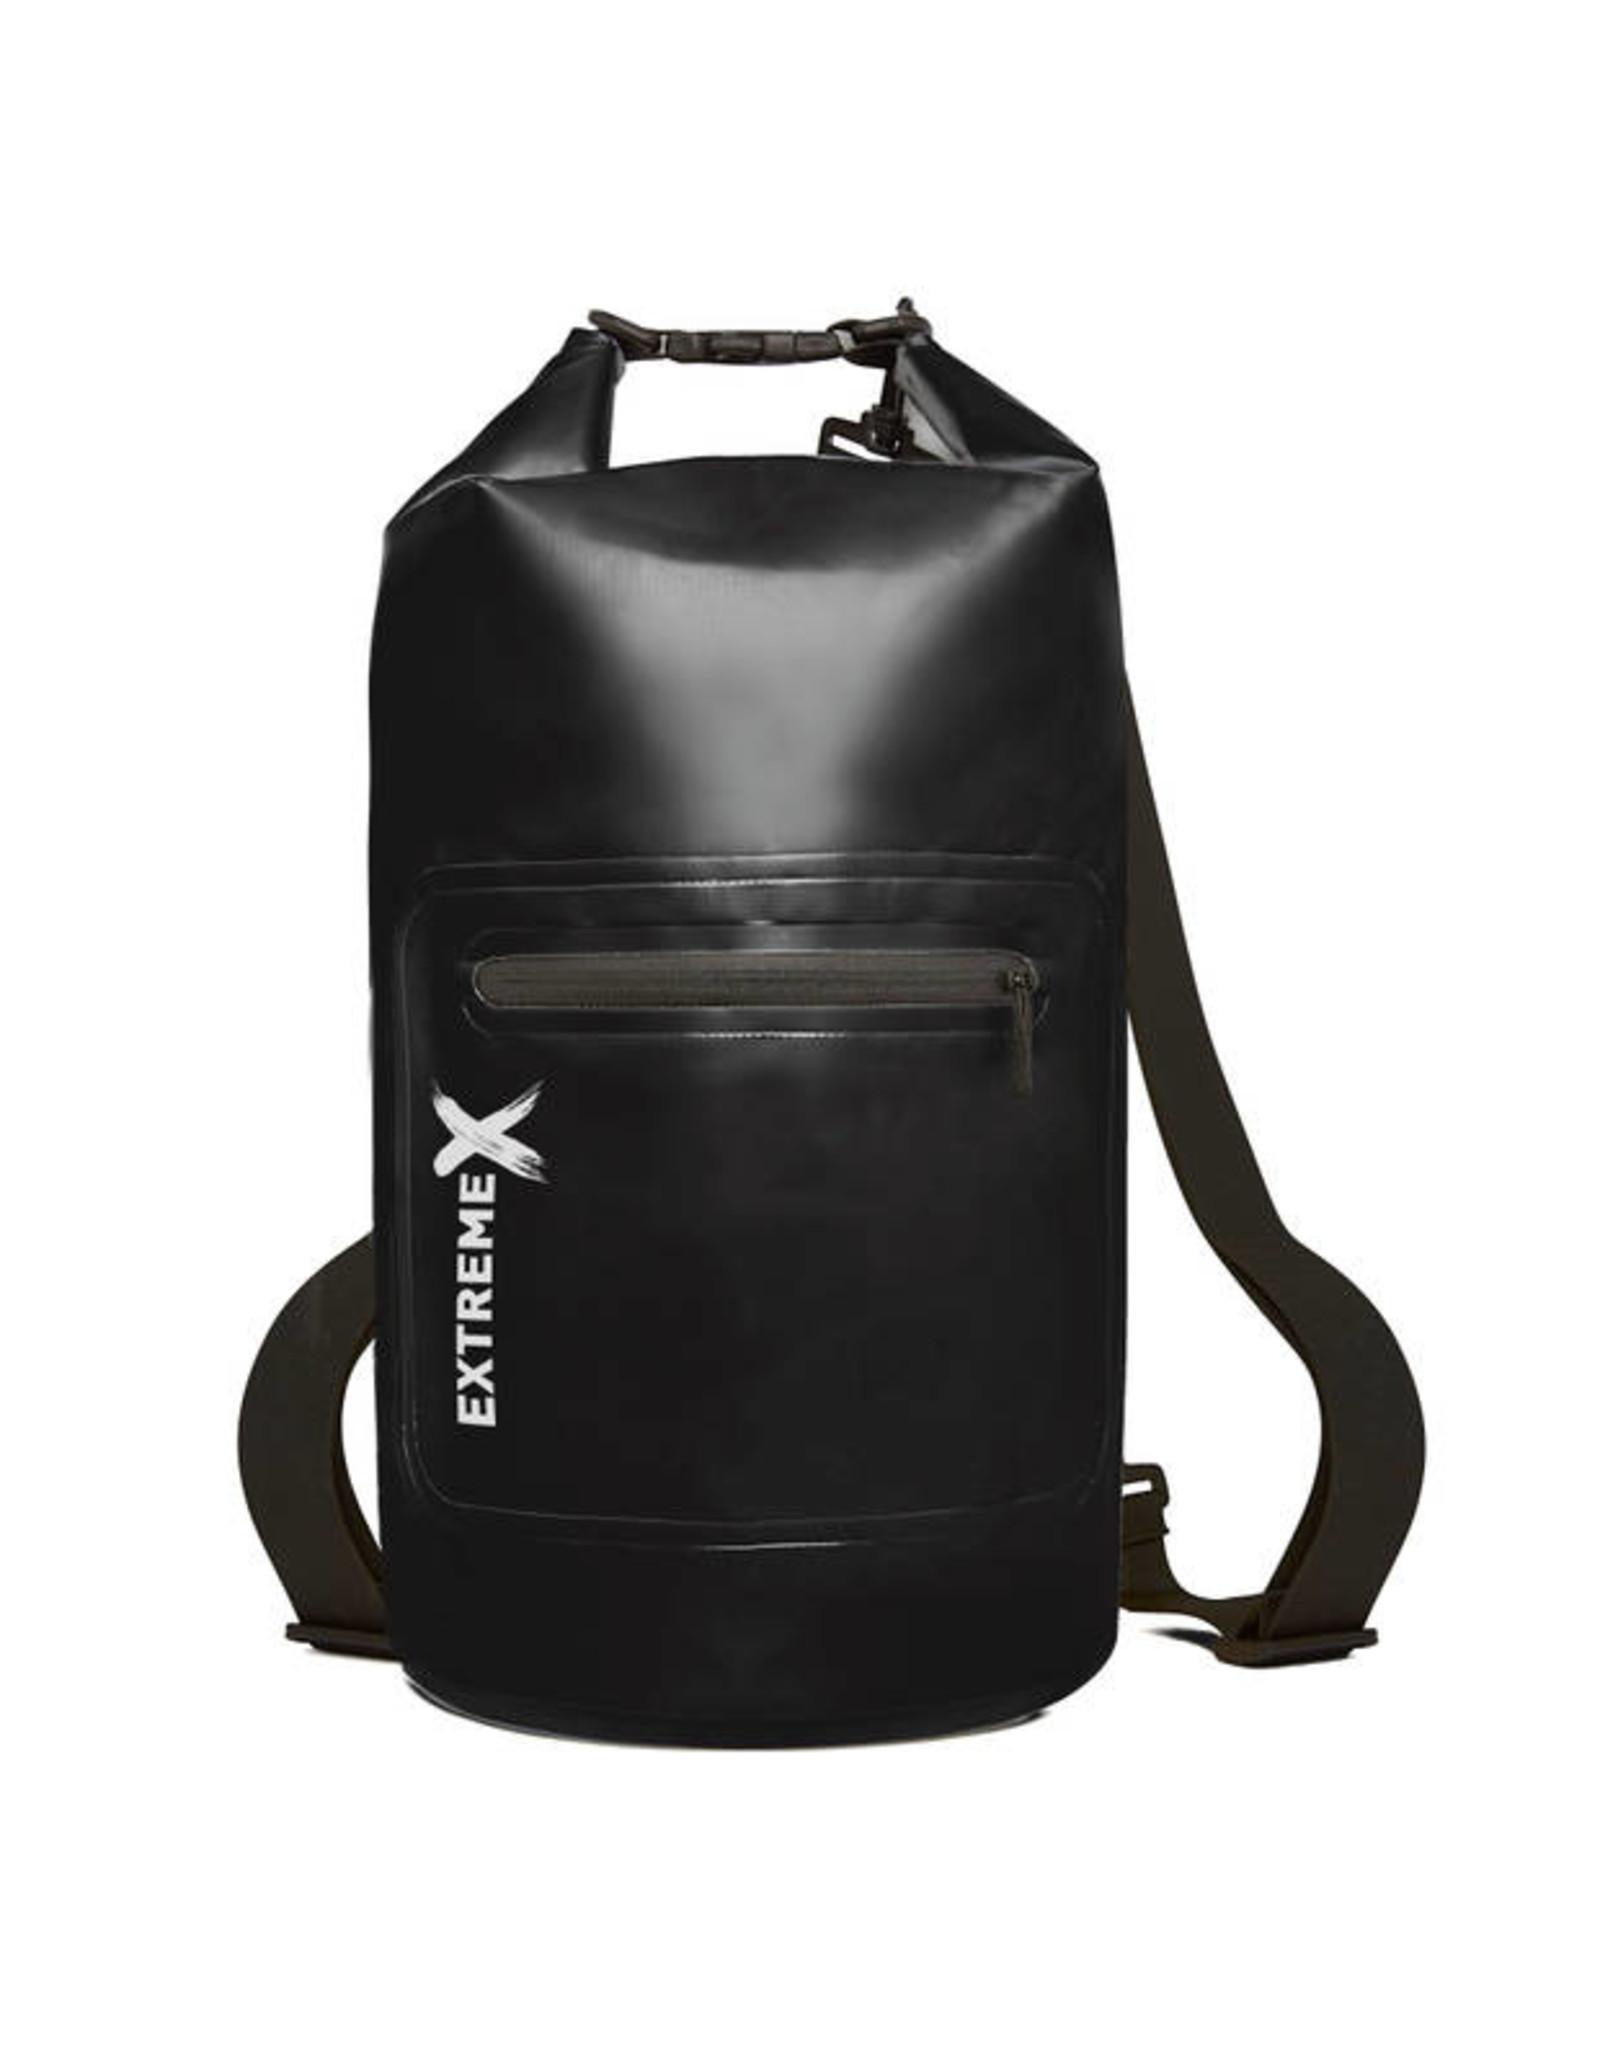 Vizu VIZU ExtremeX 20L Water Resistant Dry Bag